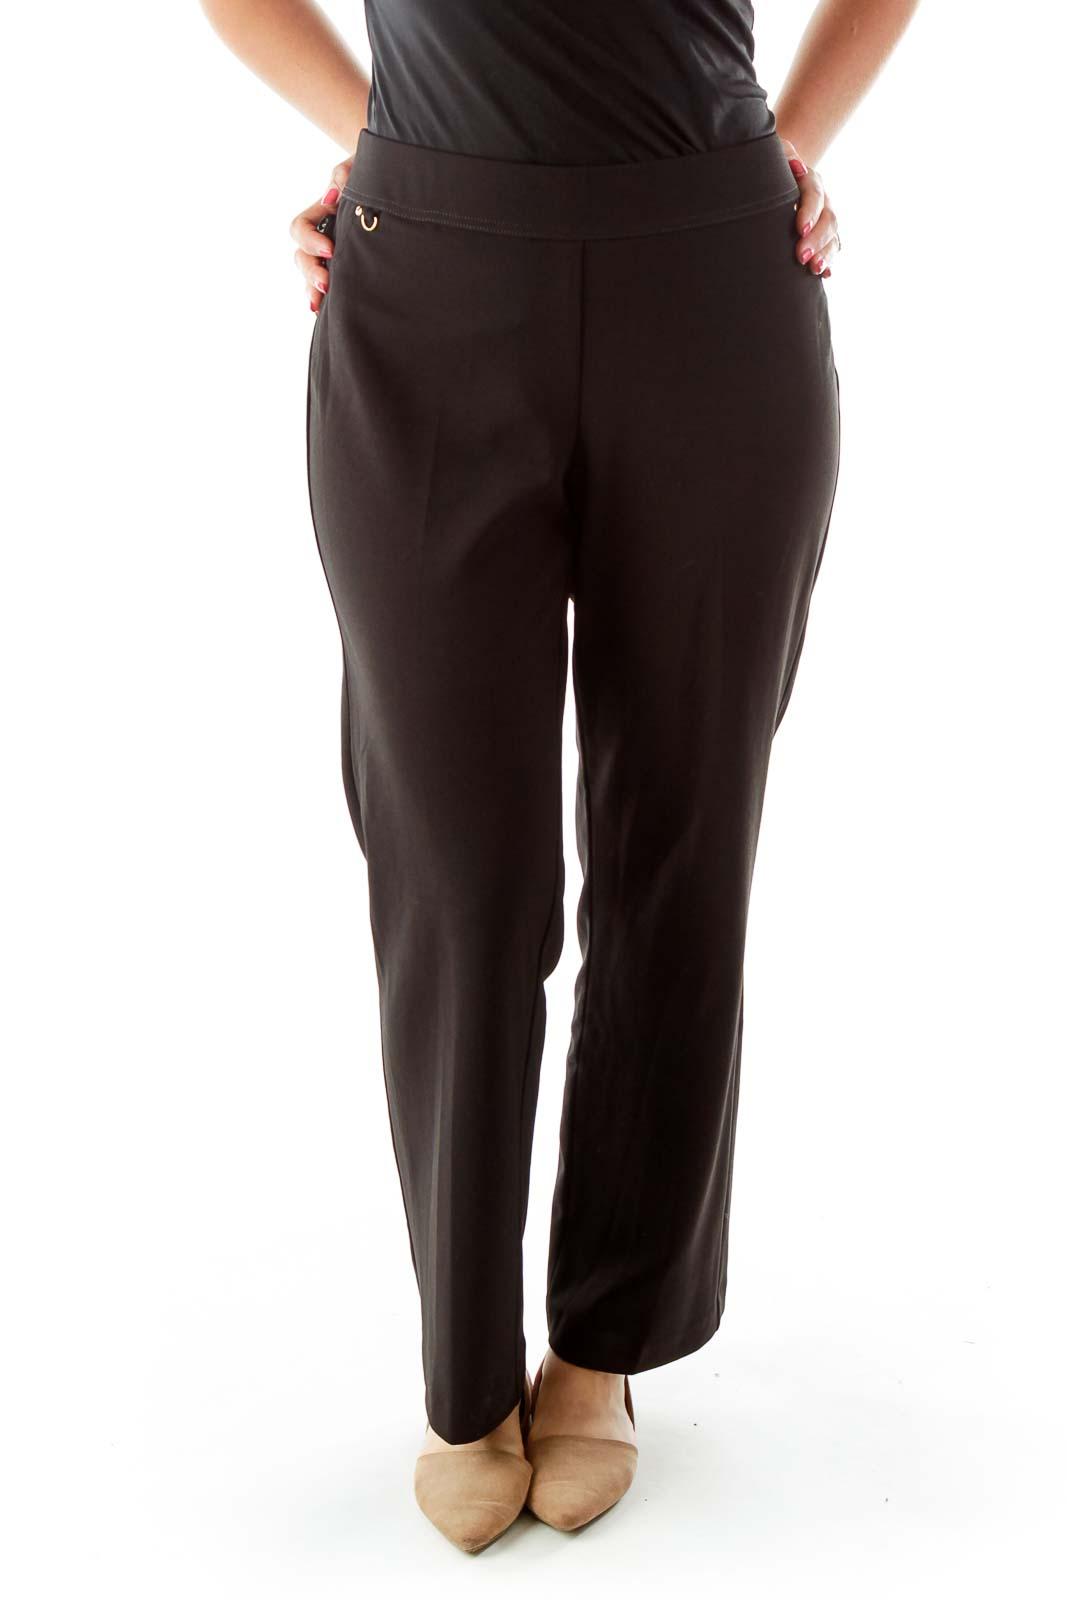 Black Elastic Waist Straight Fit Pants Front